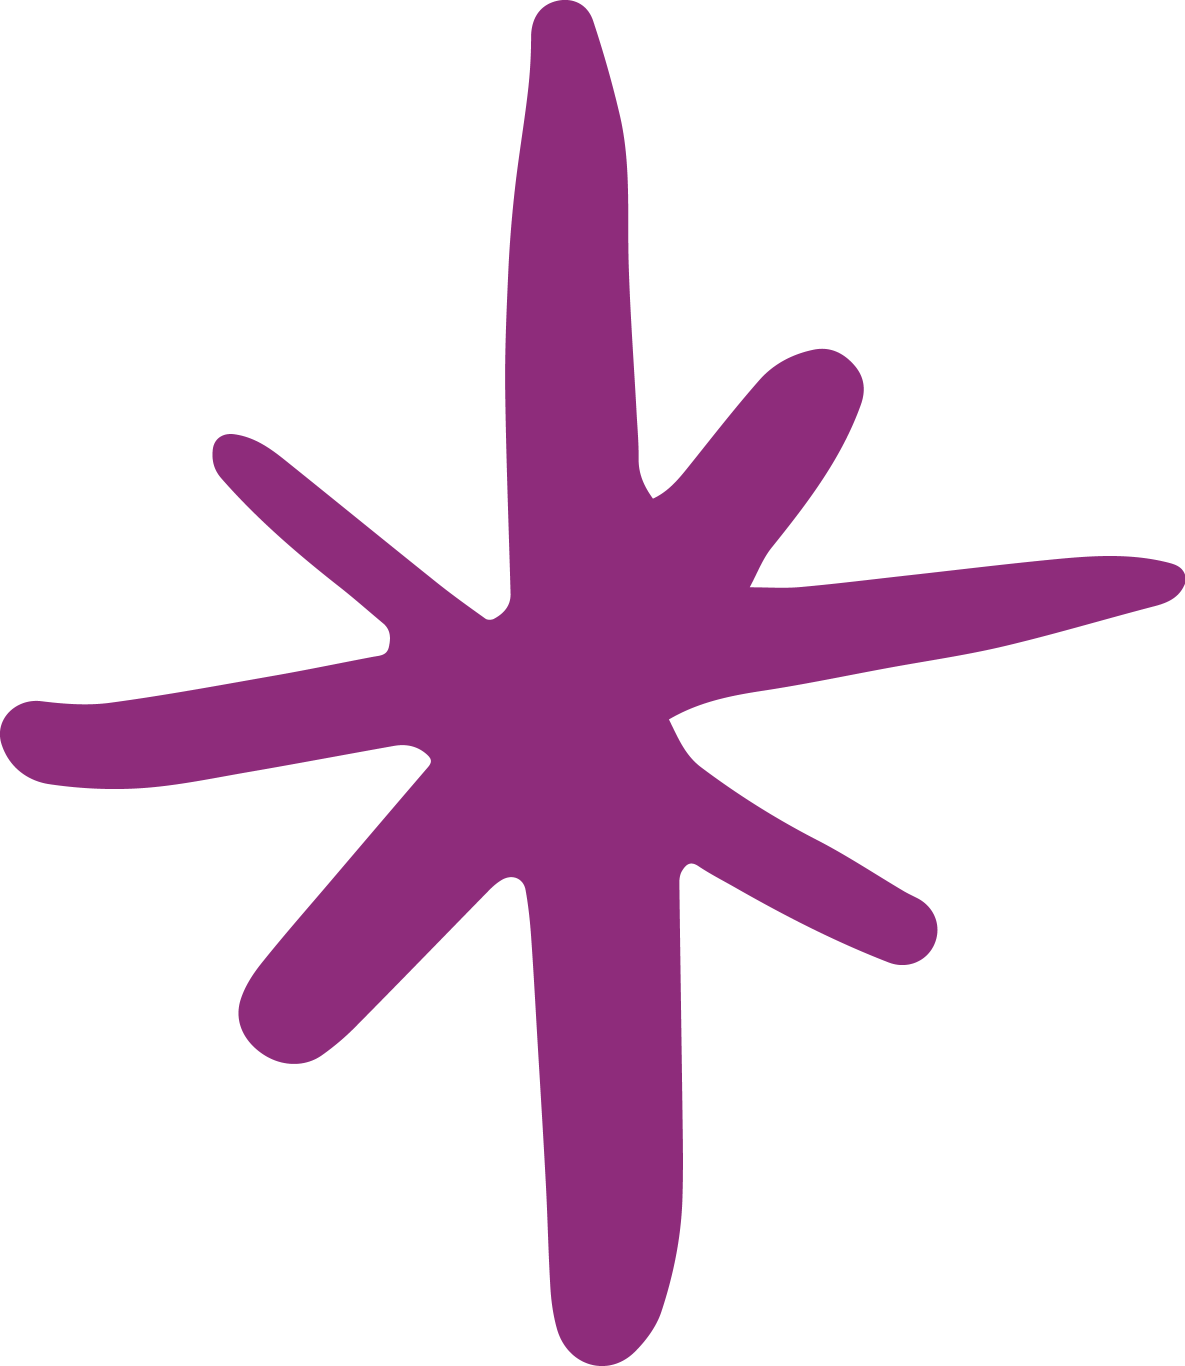 asterisk star in purple